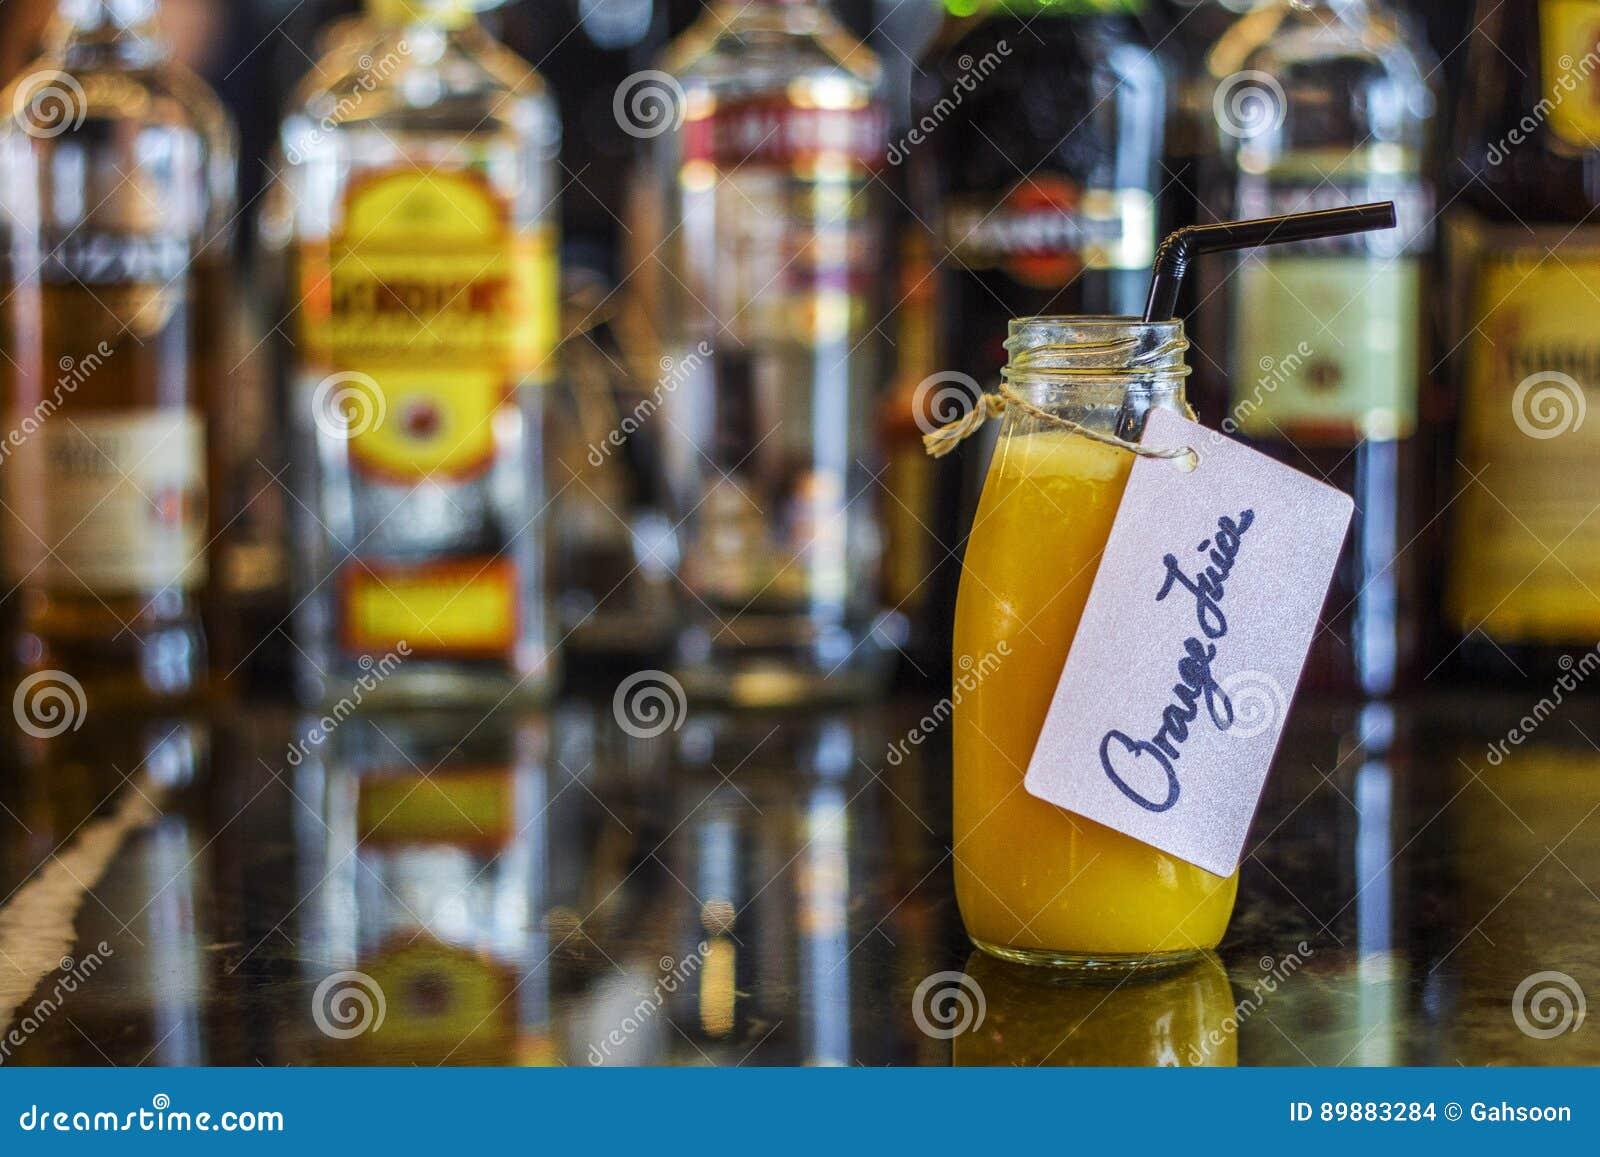 Tremendous Fresh Orange Juice On Bar Table Stock Photo Image Of Food Download Free Architecture Designs Intelgarnamadebymaigaardcom